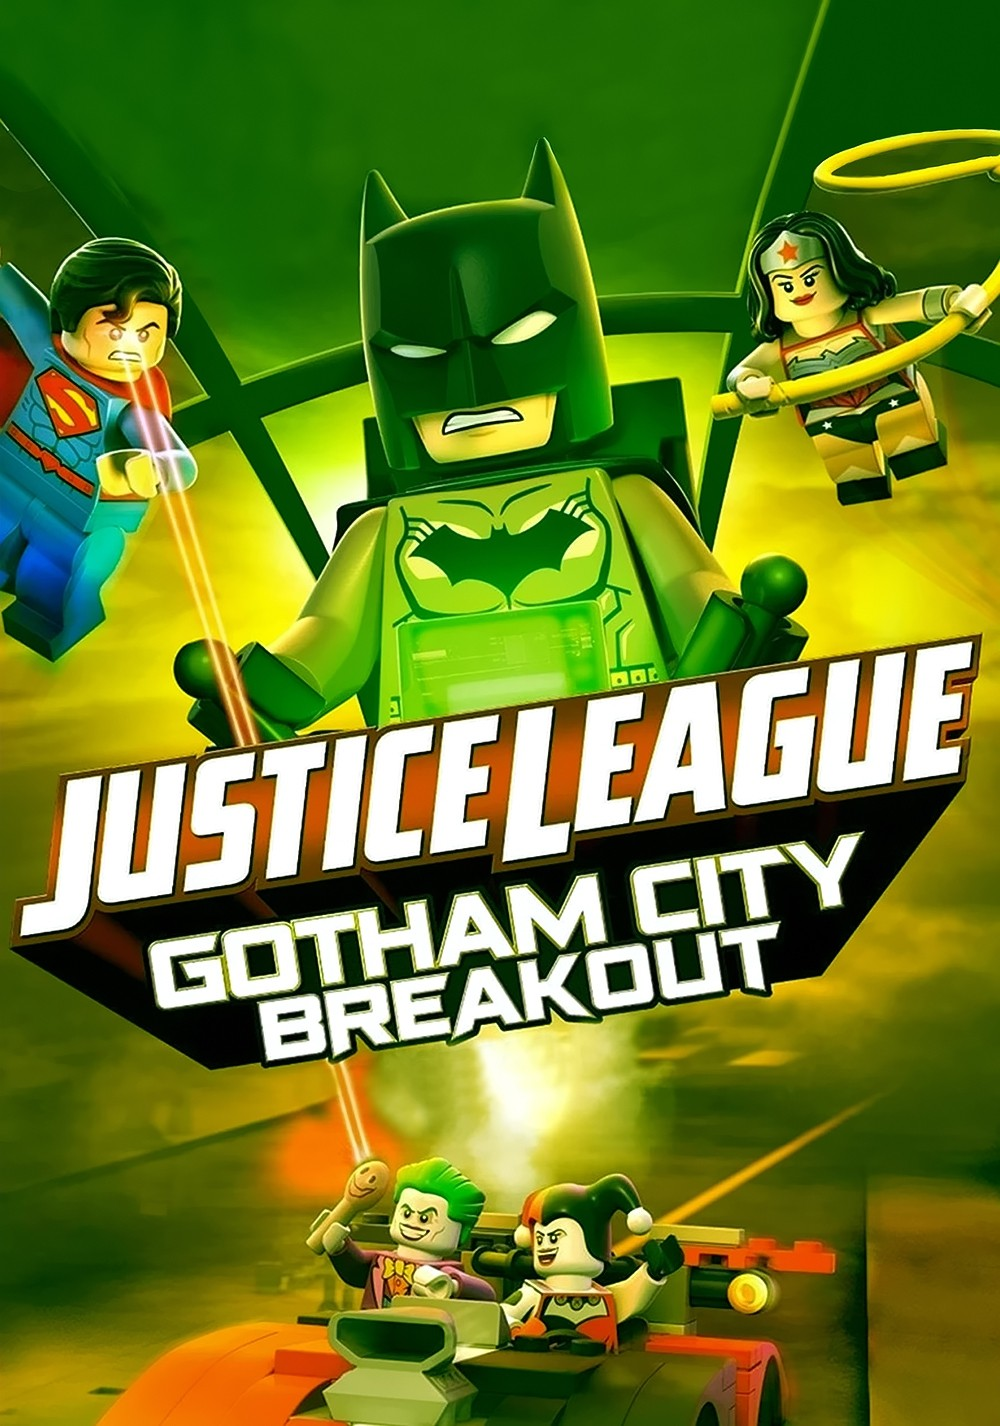 Lego Dc Comics Super Heroes Justice League Gotham C Digital Movie Mania